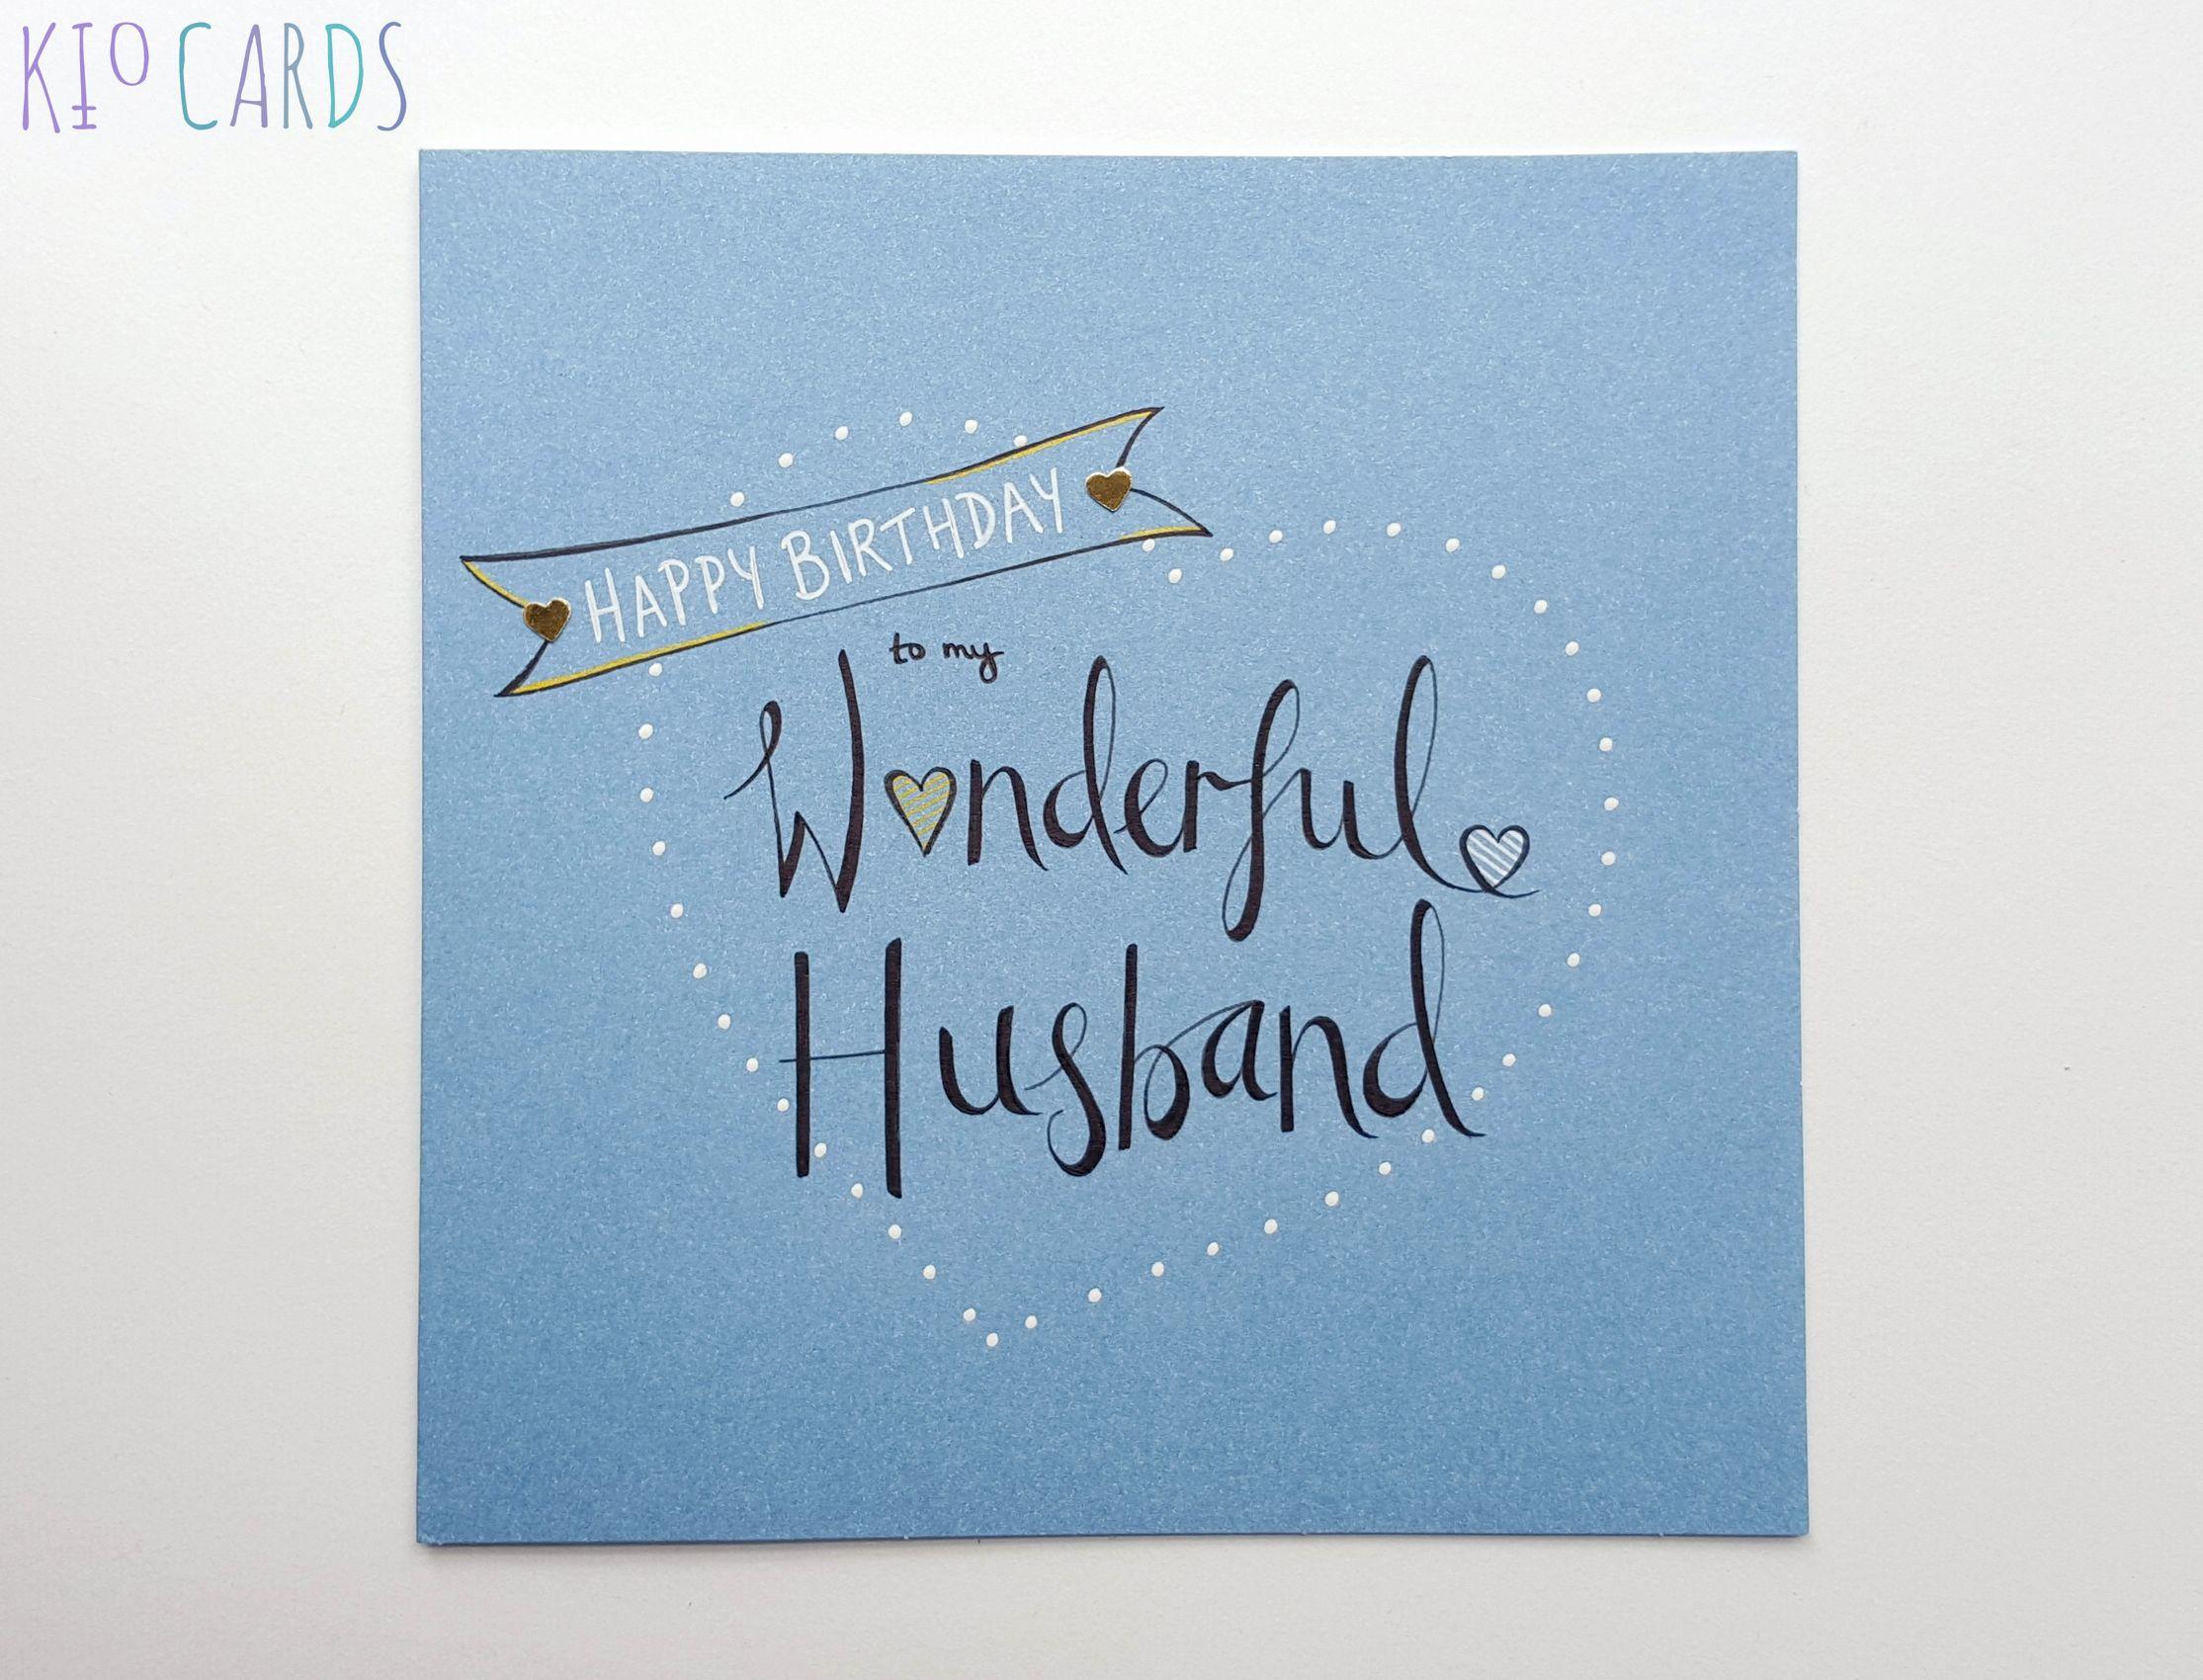 Birthday Card For Husband.Wonderful Husband Birthday Card Cool Birthday Cards